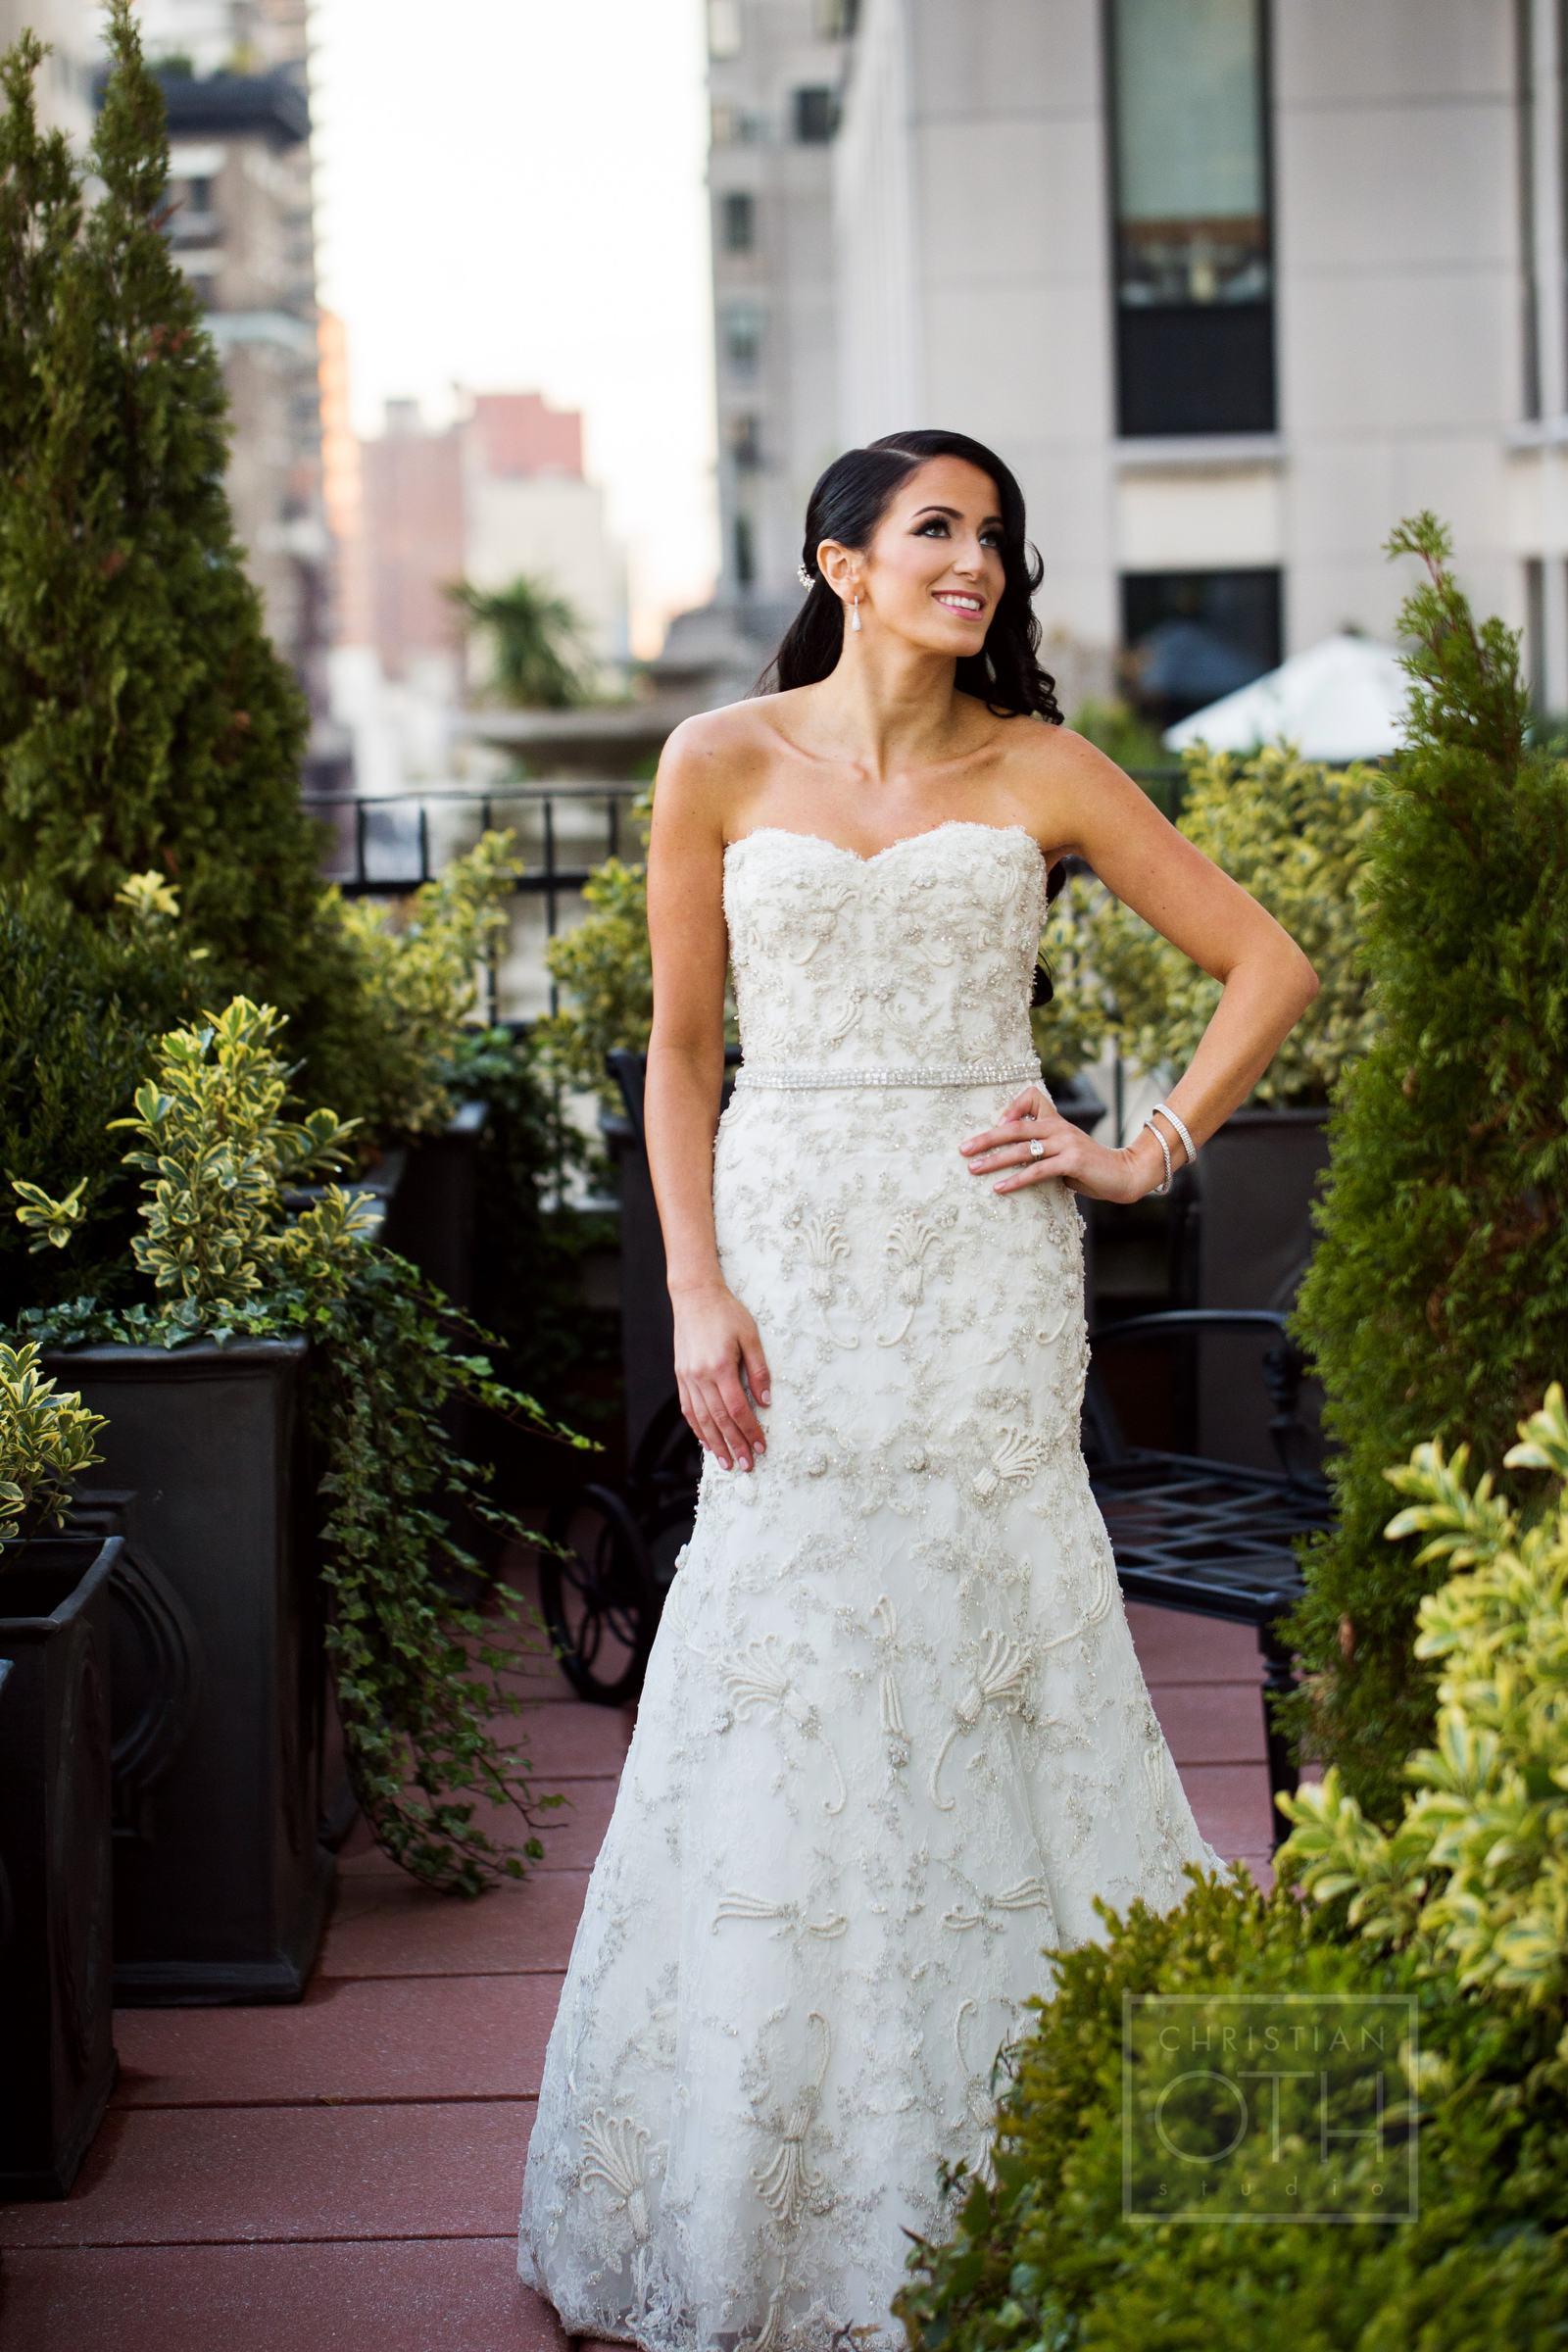 Ceci_New_York_Custom_Invitation_Pierre__City_ Destination_Wedding_Luxury_Personalized_Ceci_Style_Bride_Rose_Gold_Foil_Stamping25.JPG